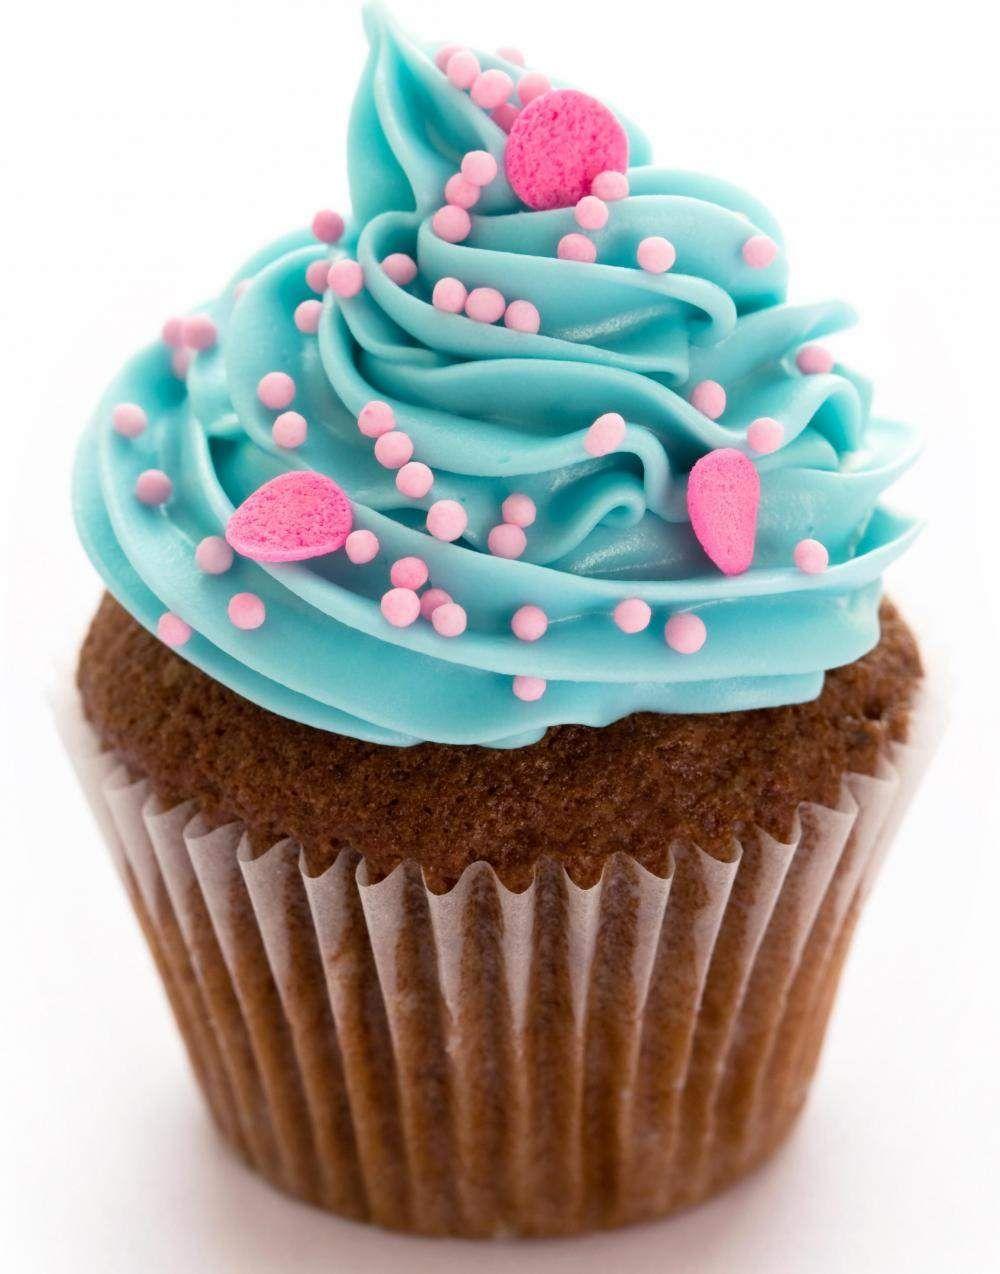 cupcake wallpaper hd - google'da ara | :-) | pinterest | food and cake